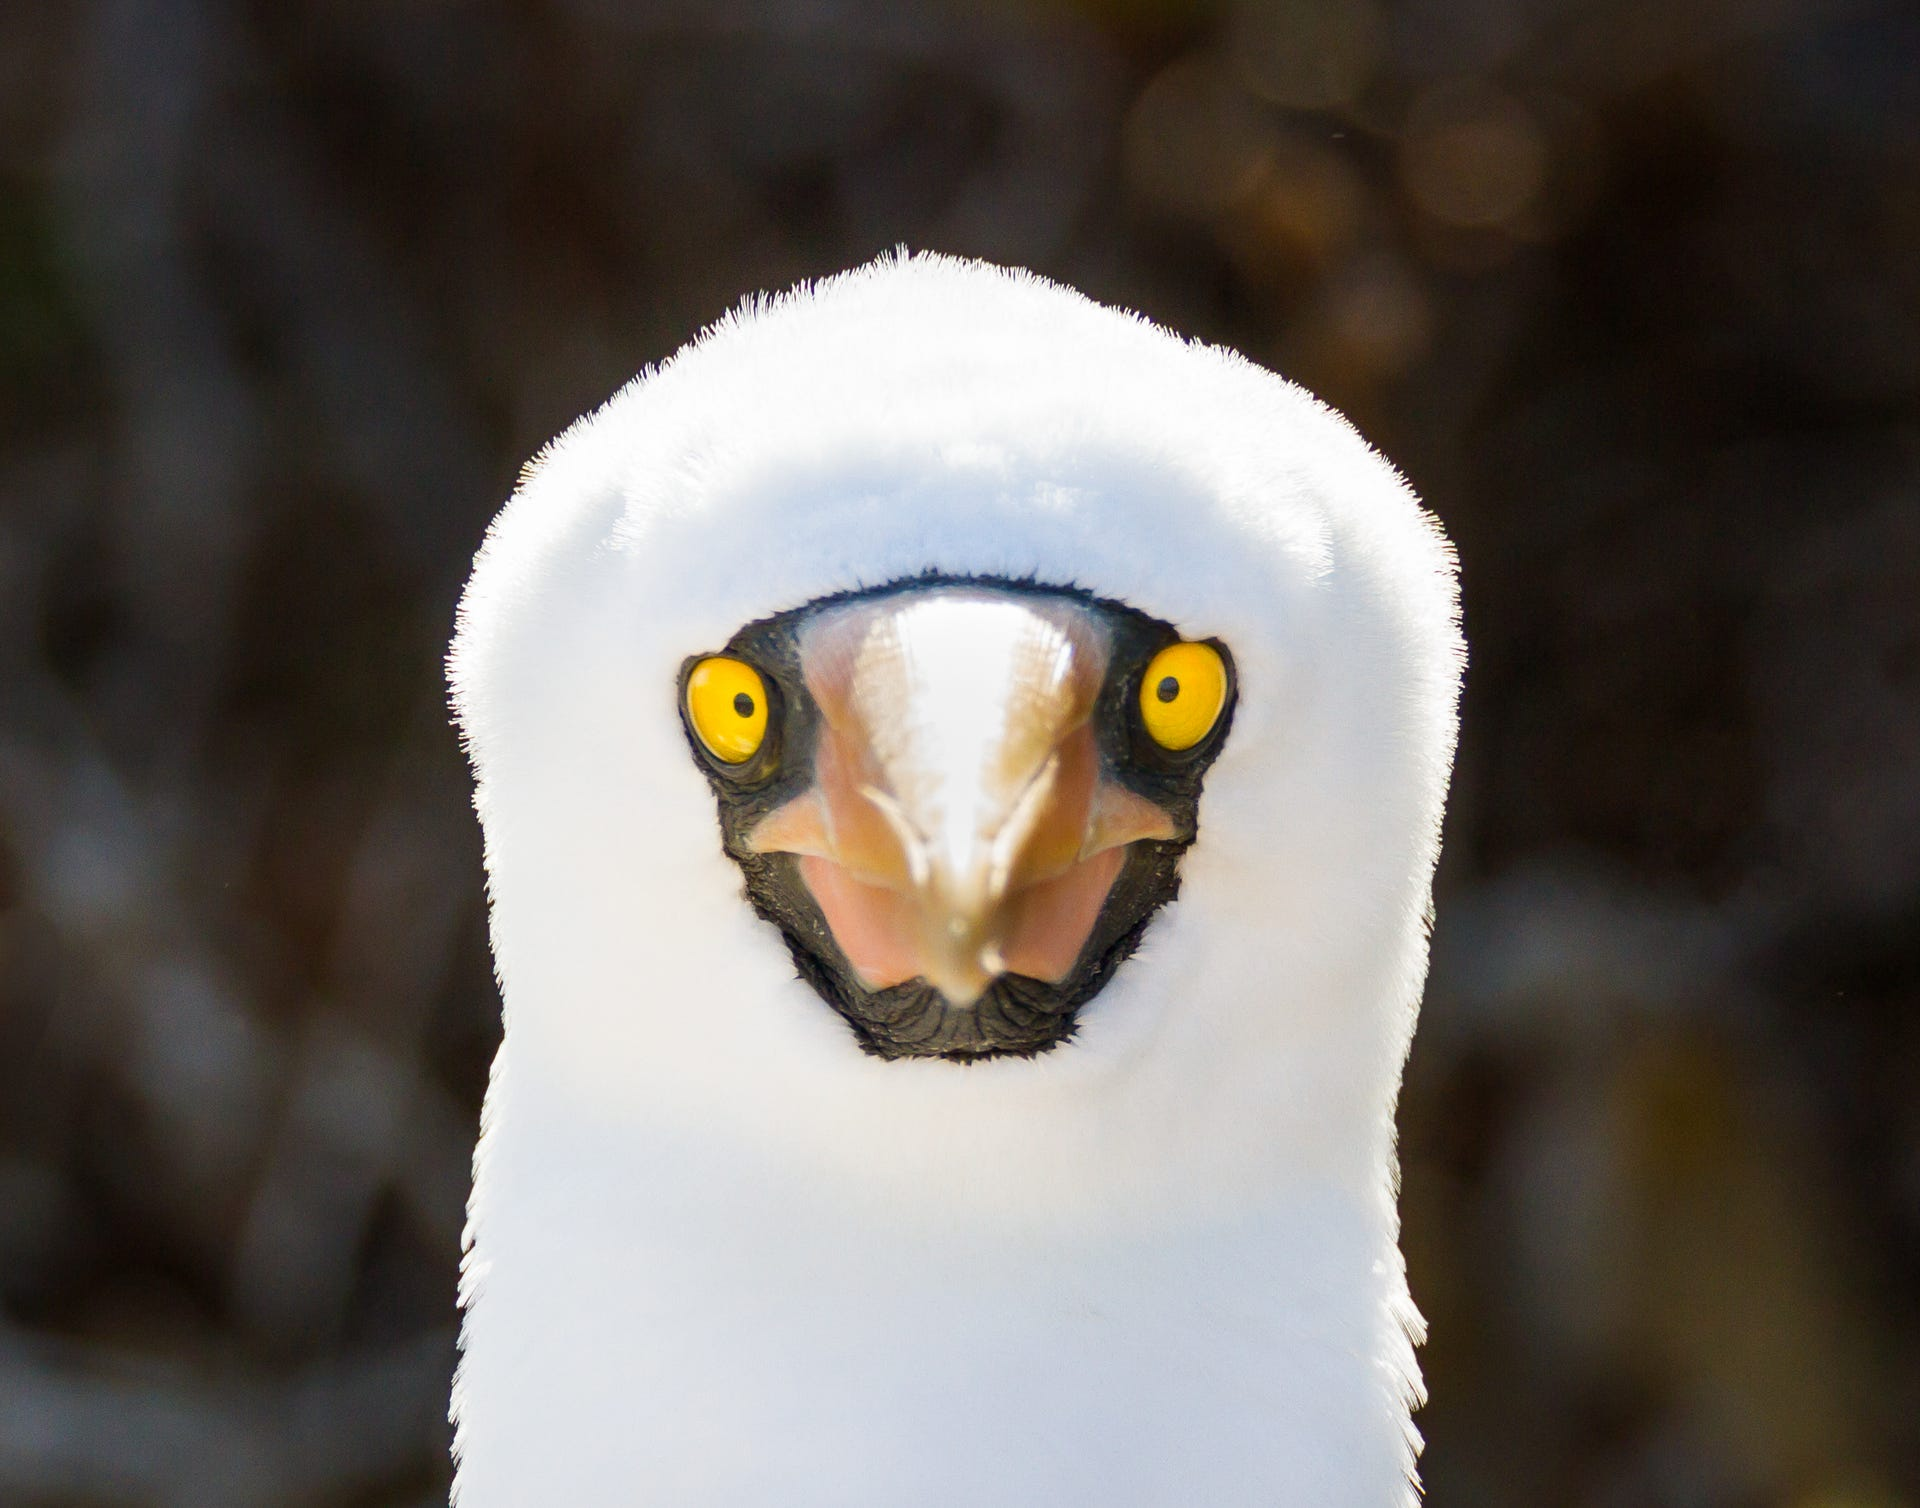 Galapagos Islands wildlife: Photos of unusual animals